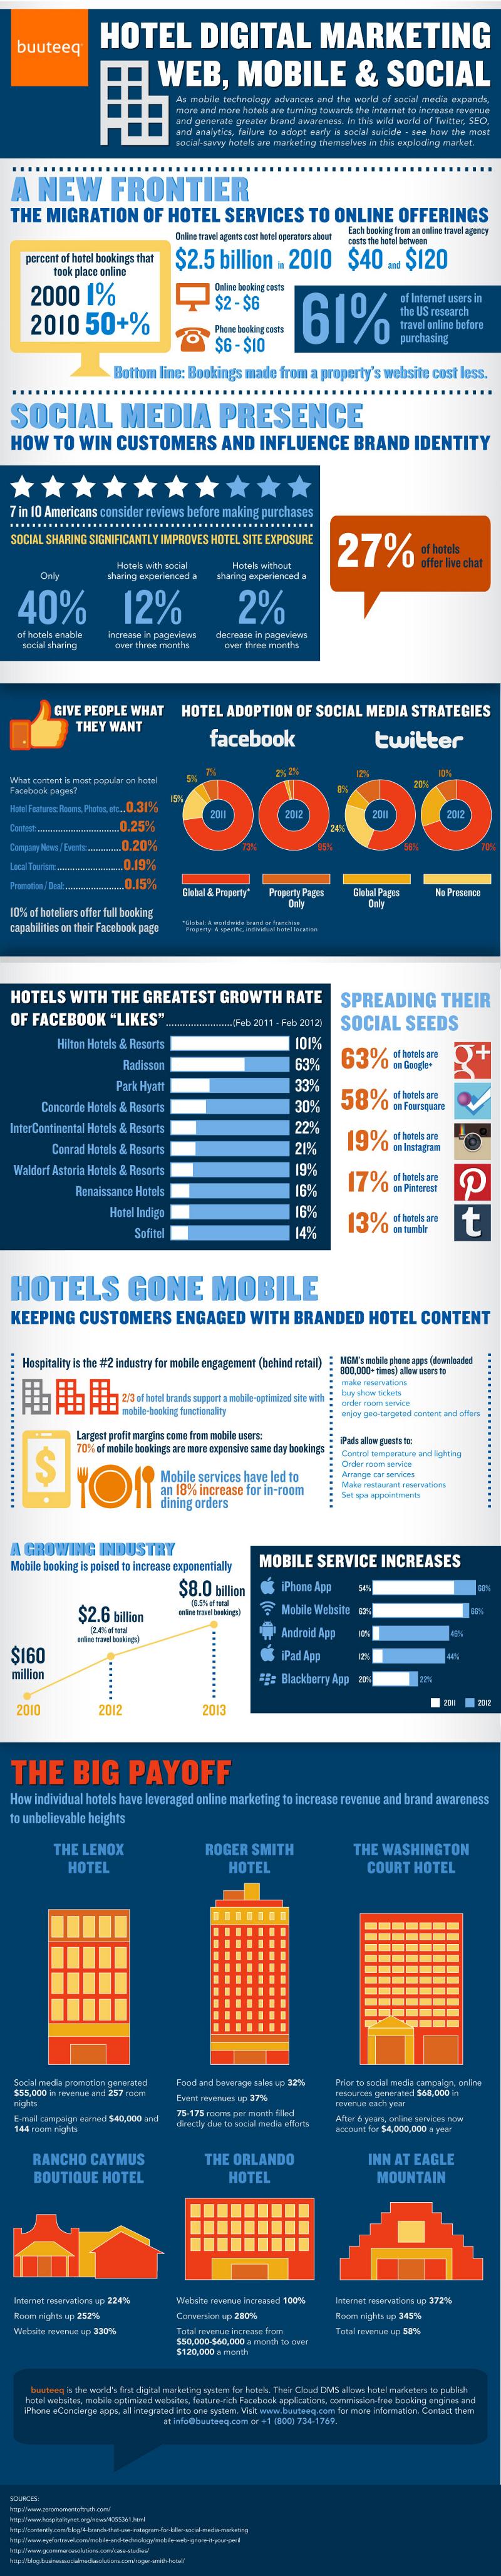 Digital Travel Marketing